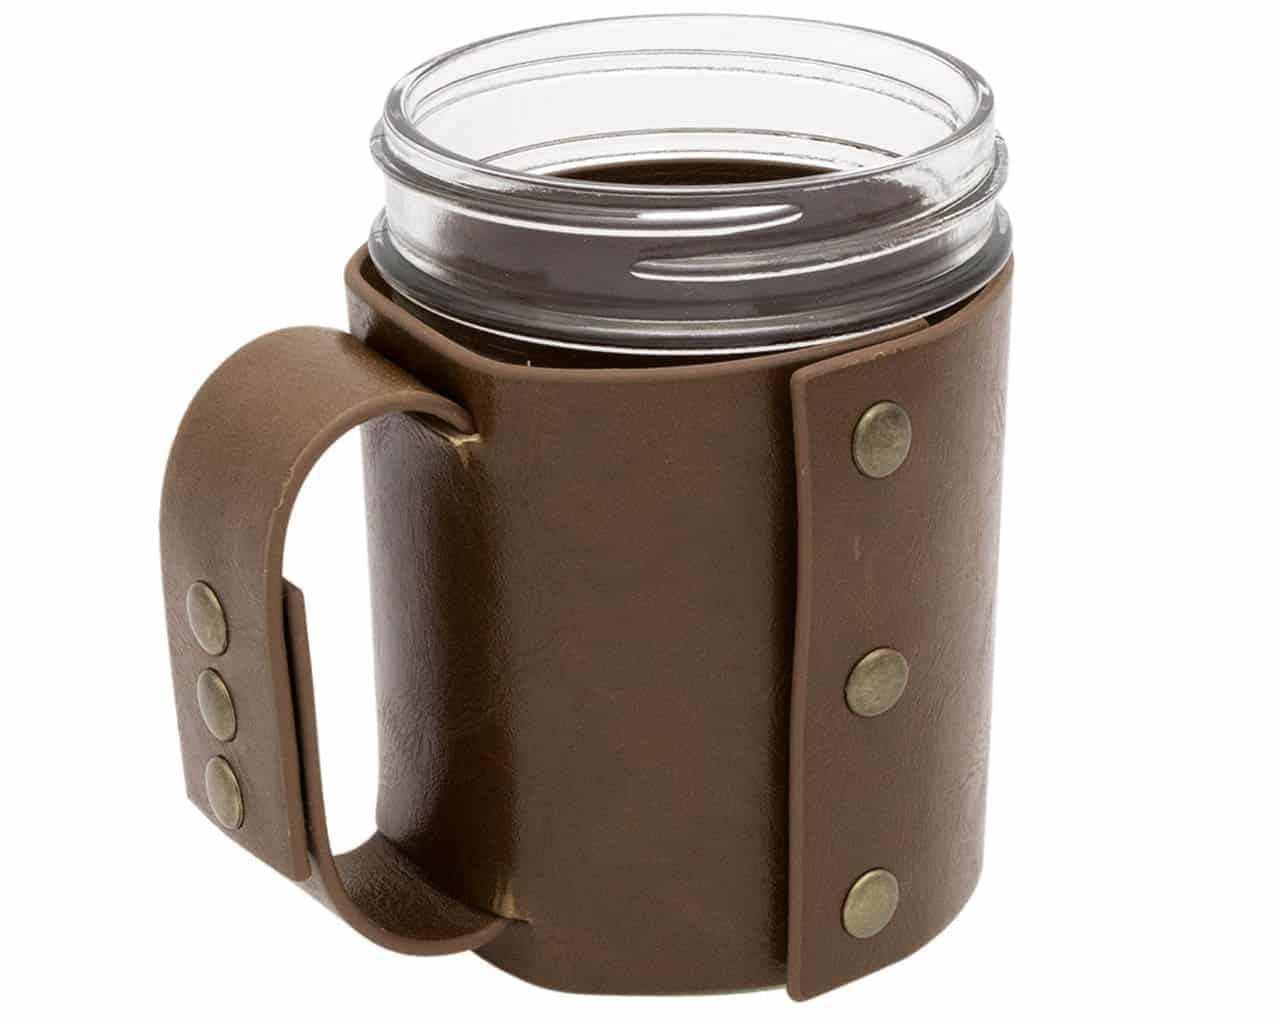 Faux Leather Sleeve With Handle Travel Mug For Mason Jars